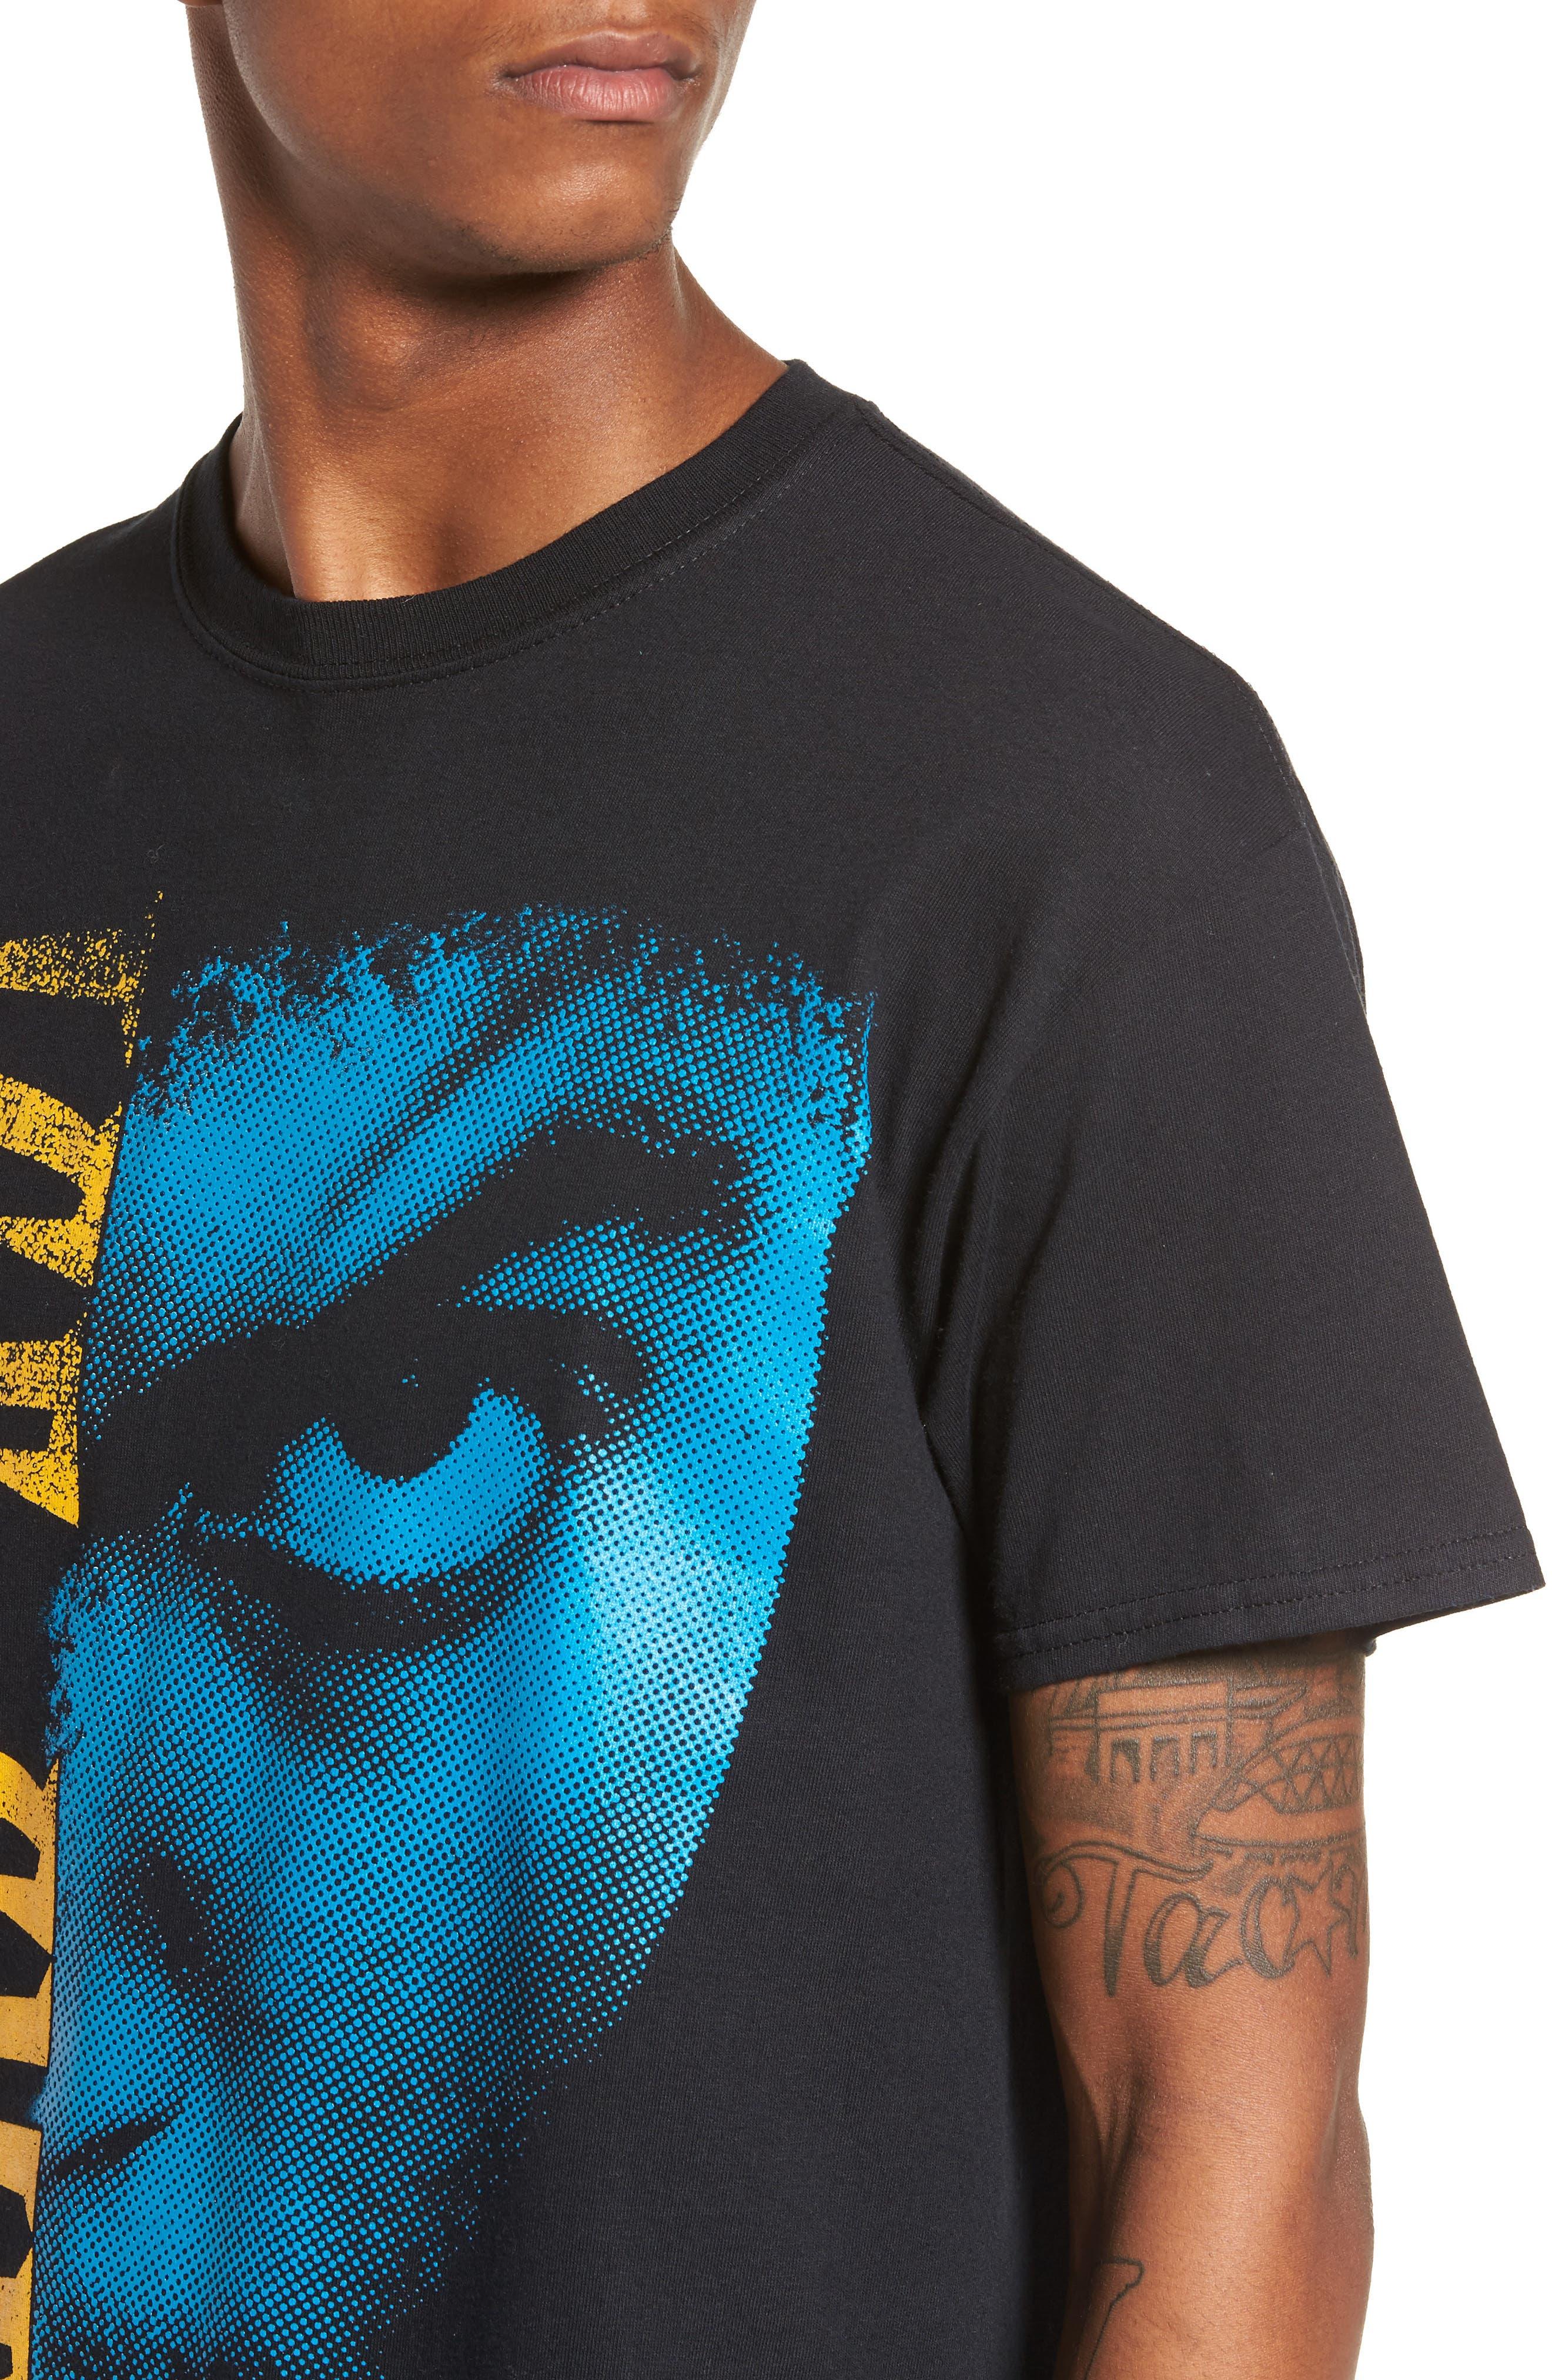 Ice Cube T-Shirt,                             Alternate thumbnail 4, color,                             Black Tee Ice Cube Face